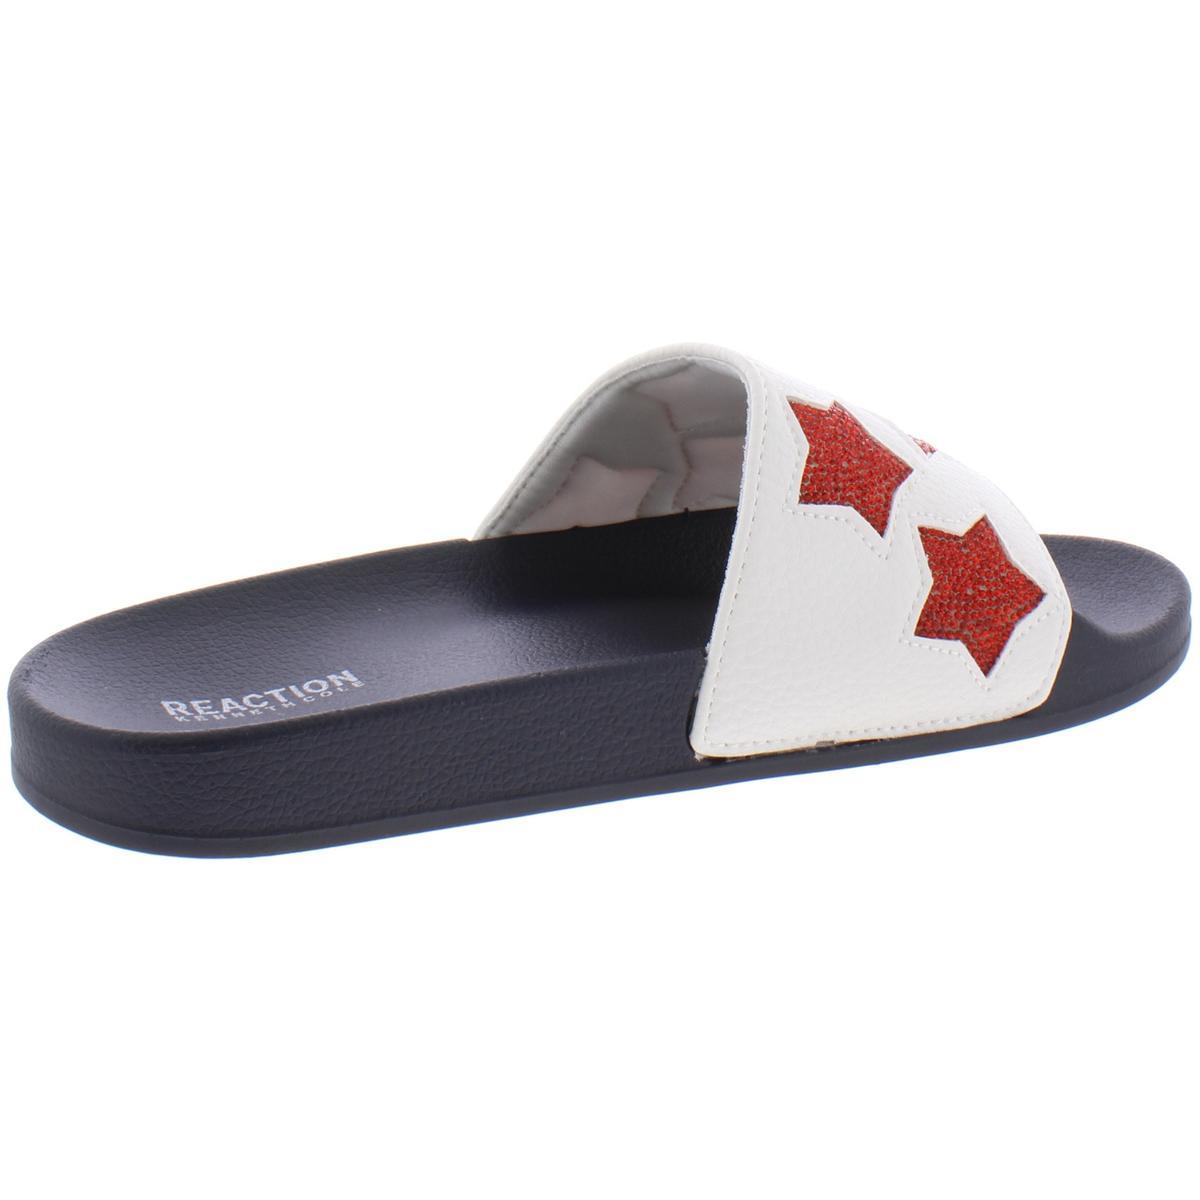 Kenneth-Cole-Reaction-Womens-Pool-Splash-Casual-Slide-Sandals-Shoes-BHFO-9500 thumbnail 4